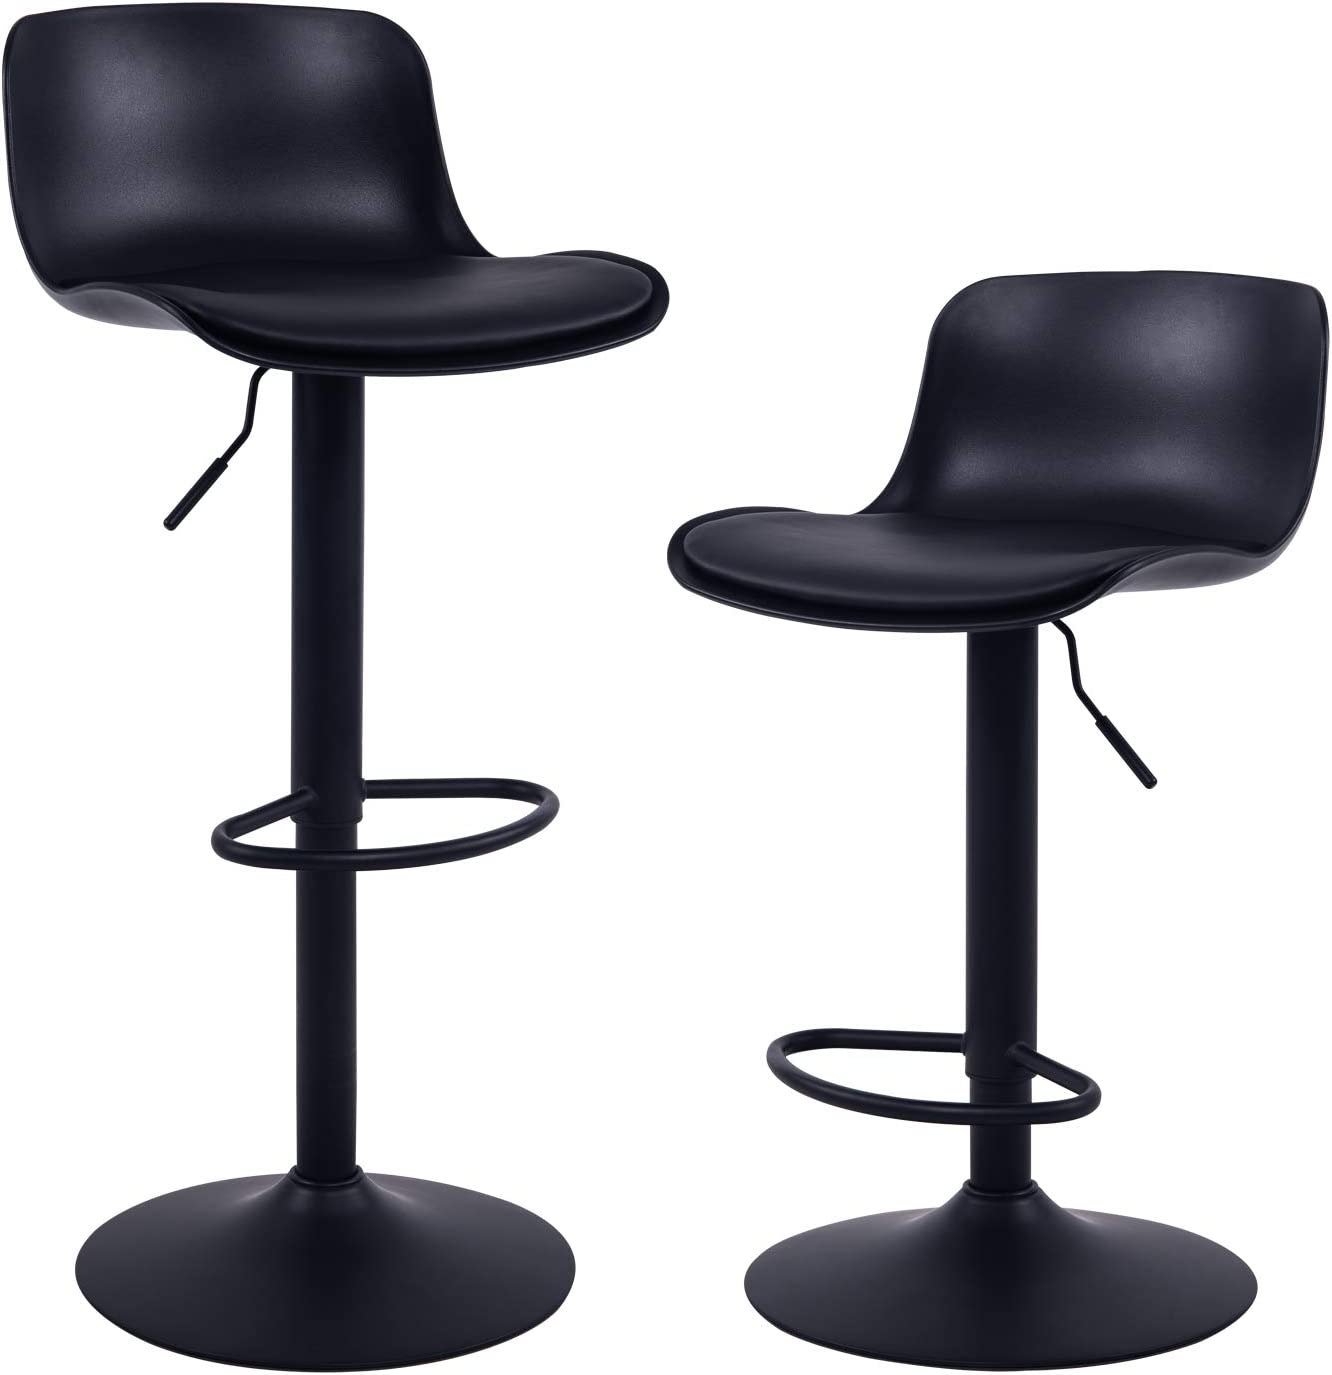 YOUNIKE Furniture Modern Design BarStools with Adjustable Height and 9°  Rotation, Ergonomic Streamlined Polypropylene High Bar stools for Bar ...